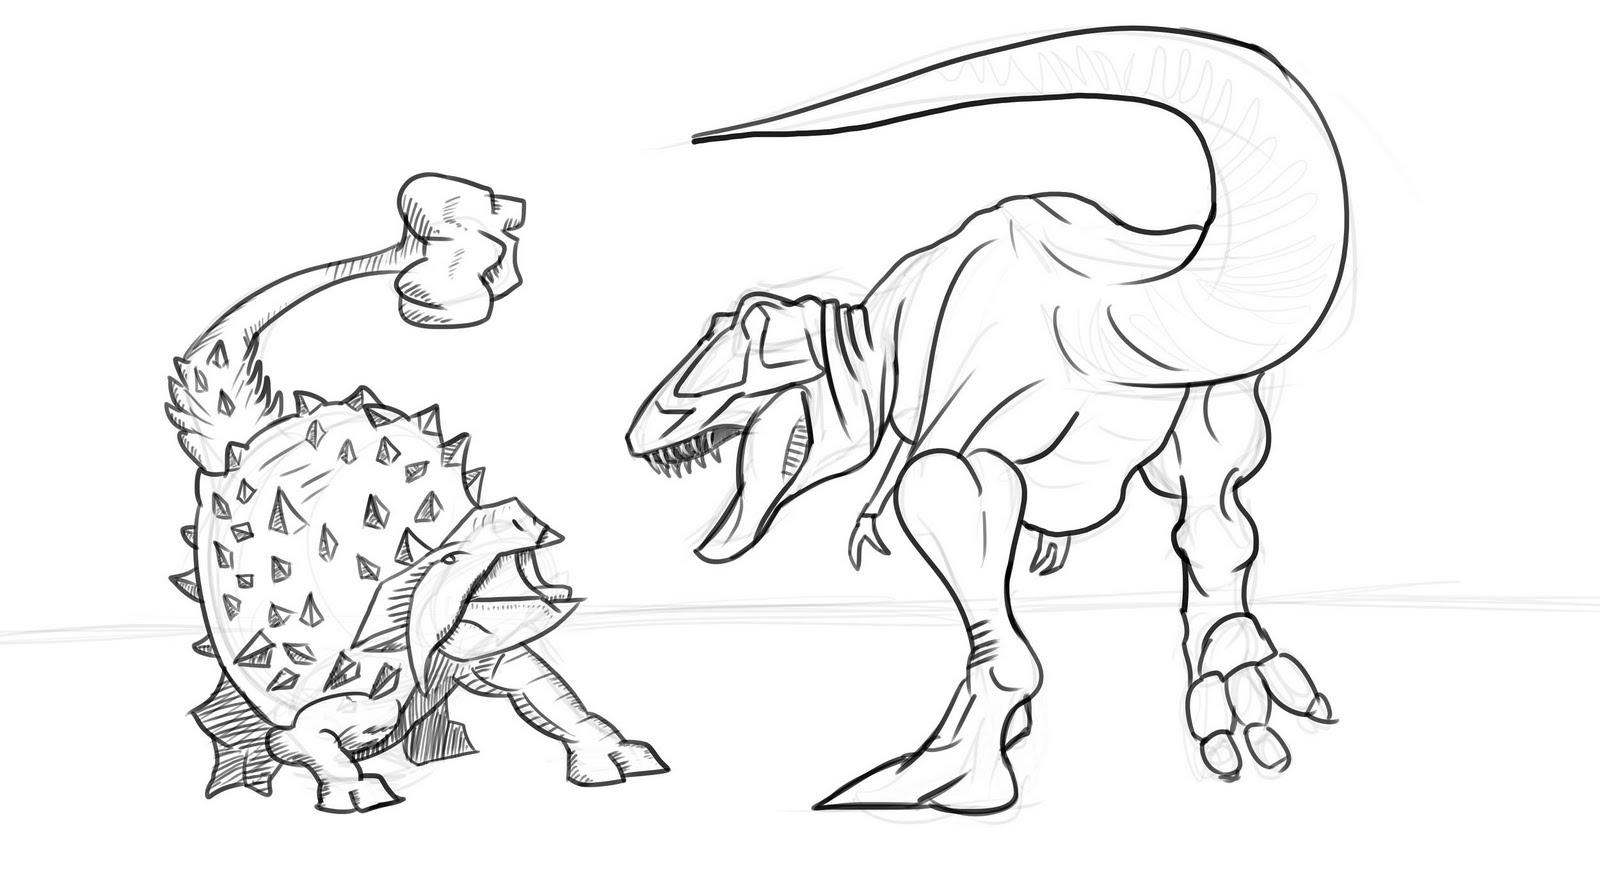 ashley u0026 39 s art dump  dinosaur sketch